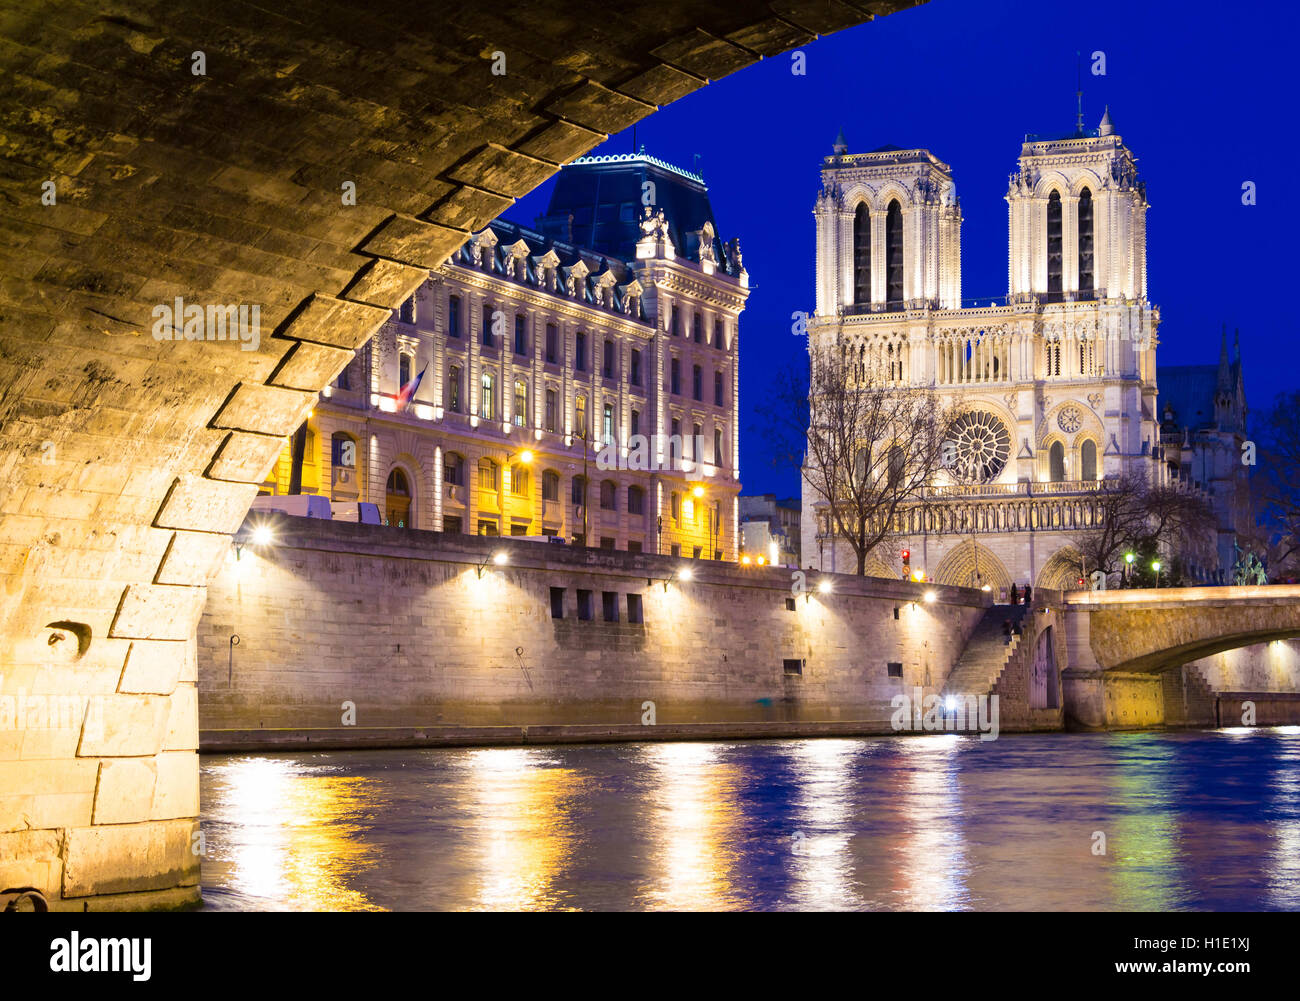 Die katholische Notre Dame Kathedrale, Paris, Frankreich. Stockbild